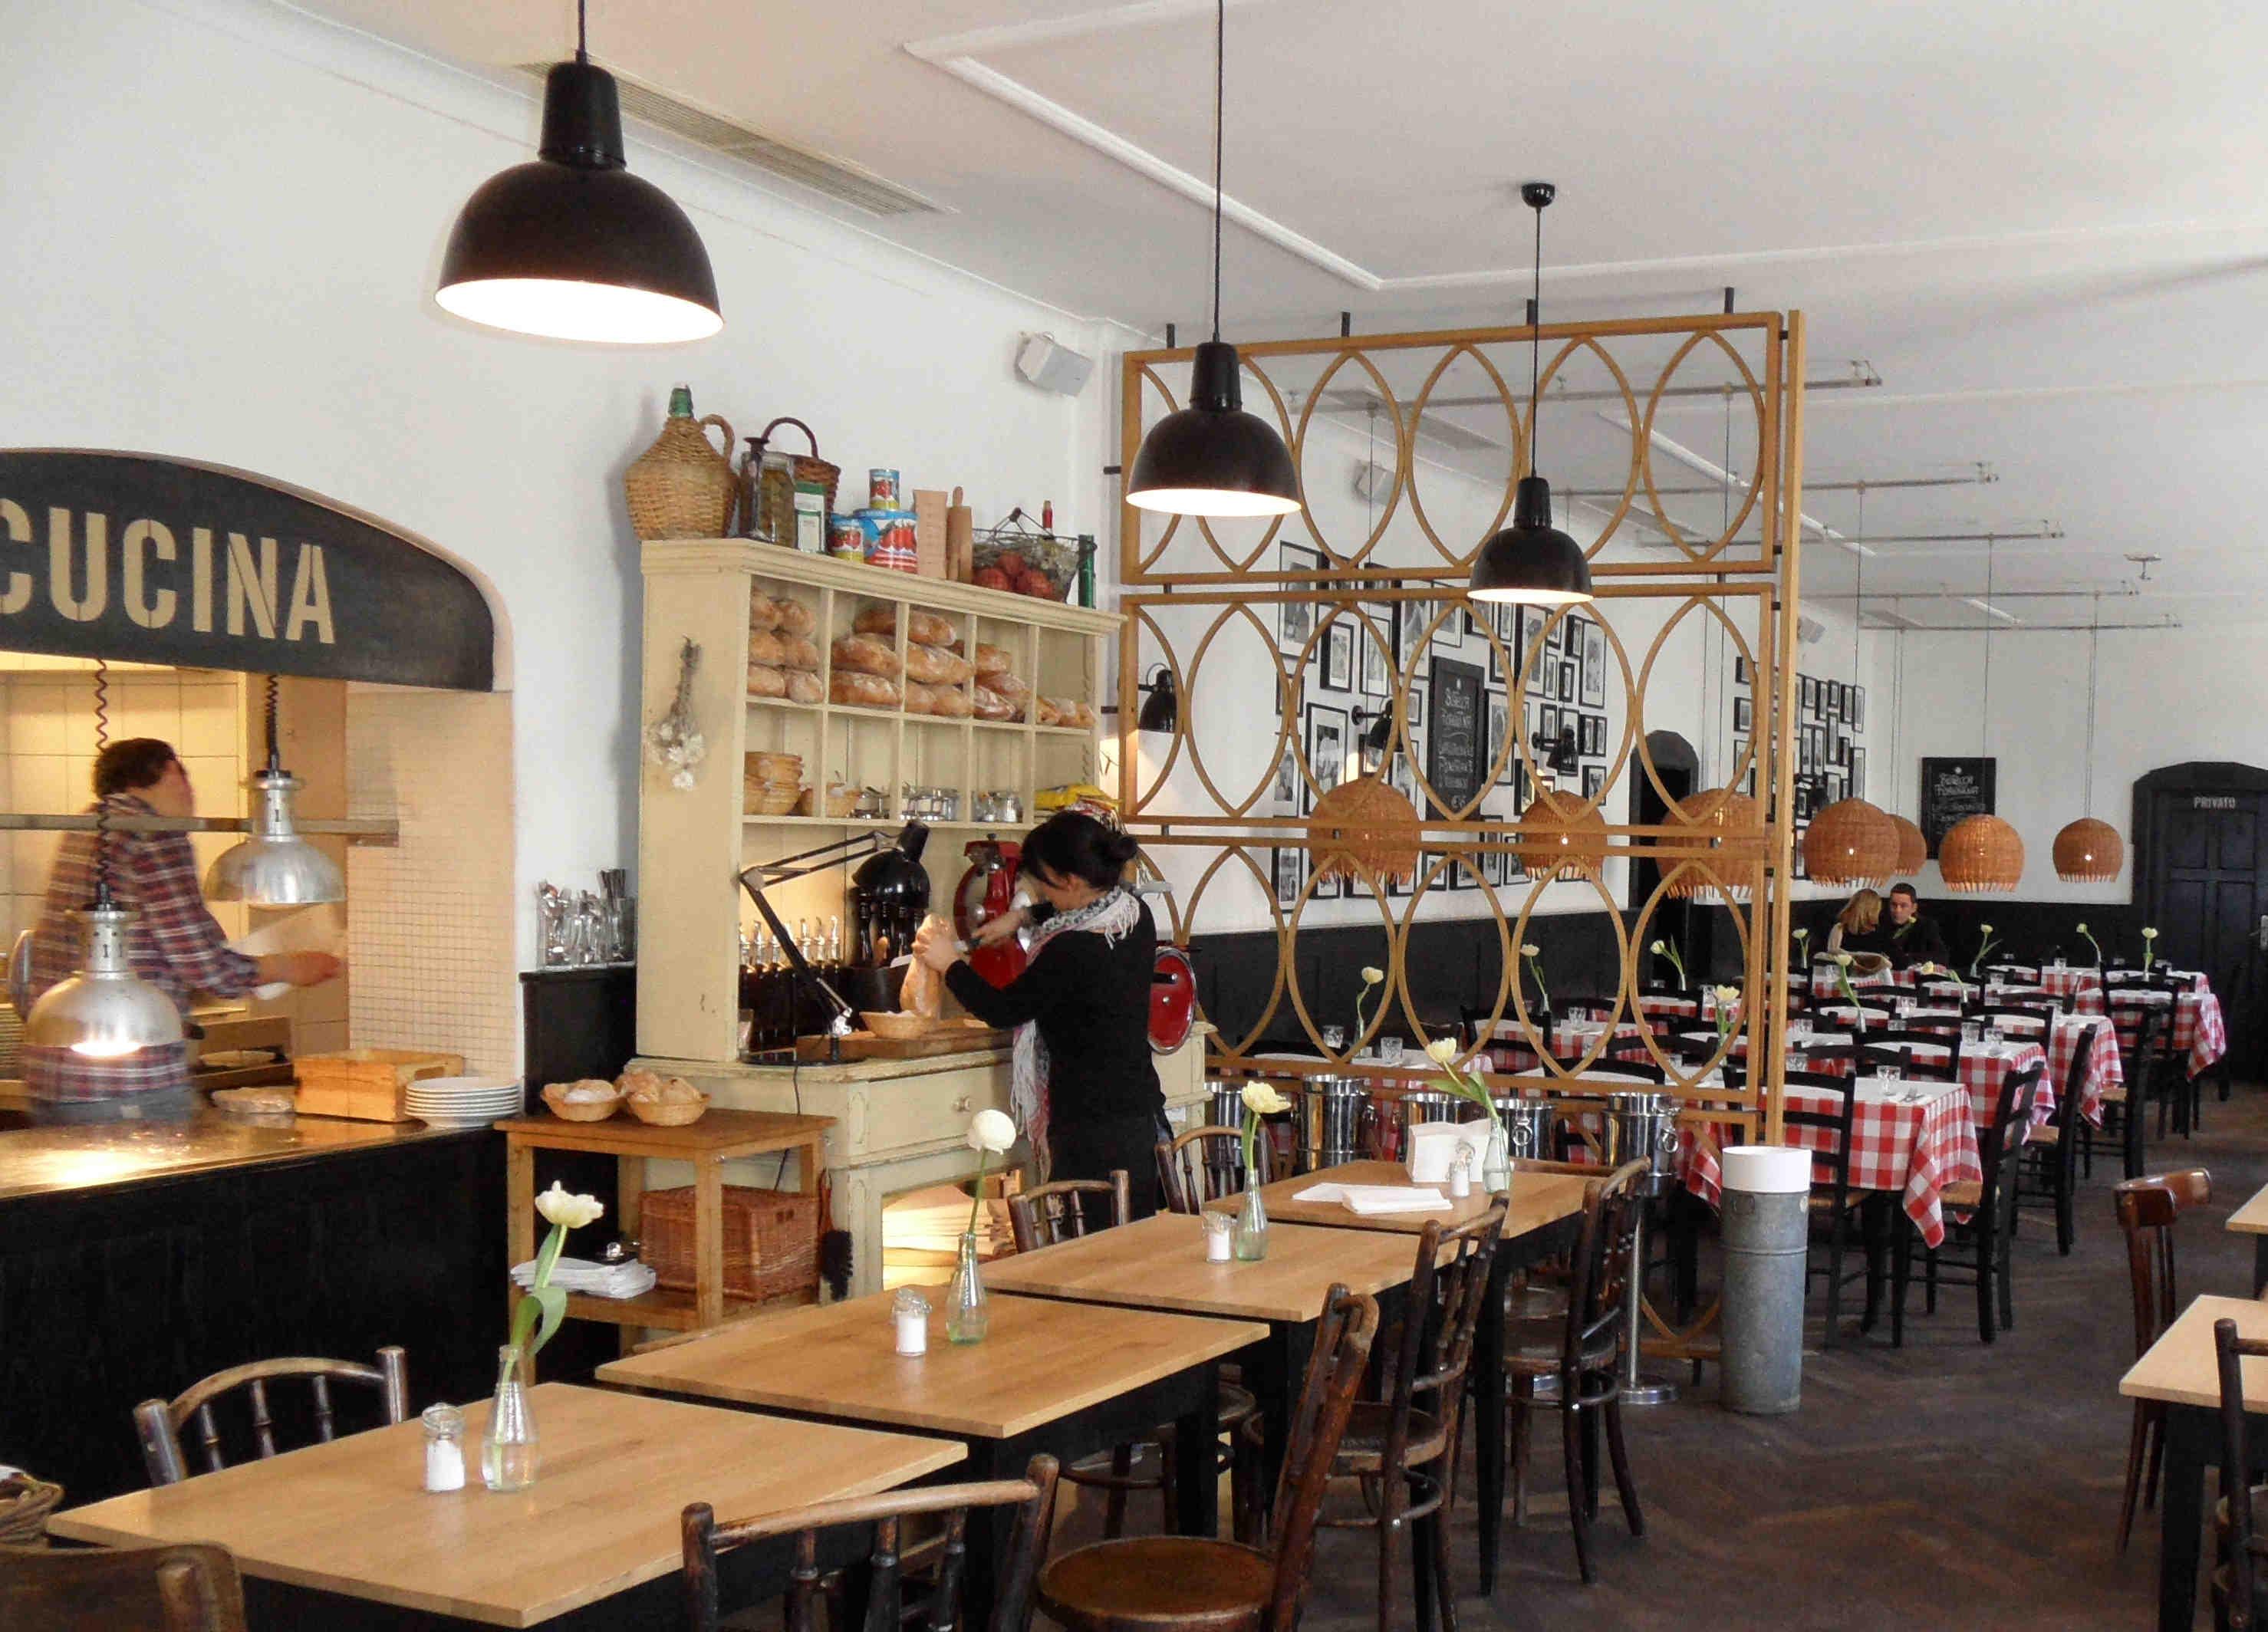 Fotogalerie: Bars, Restaurants und Cafés in Altschwabing ...